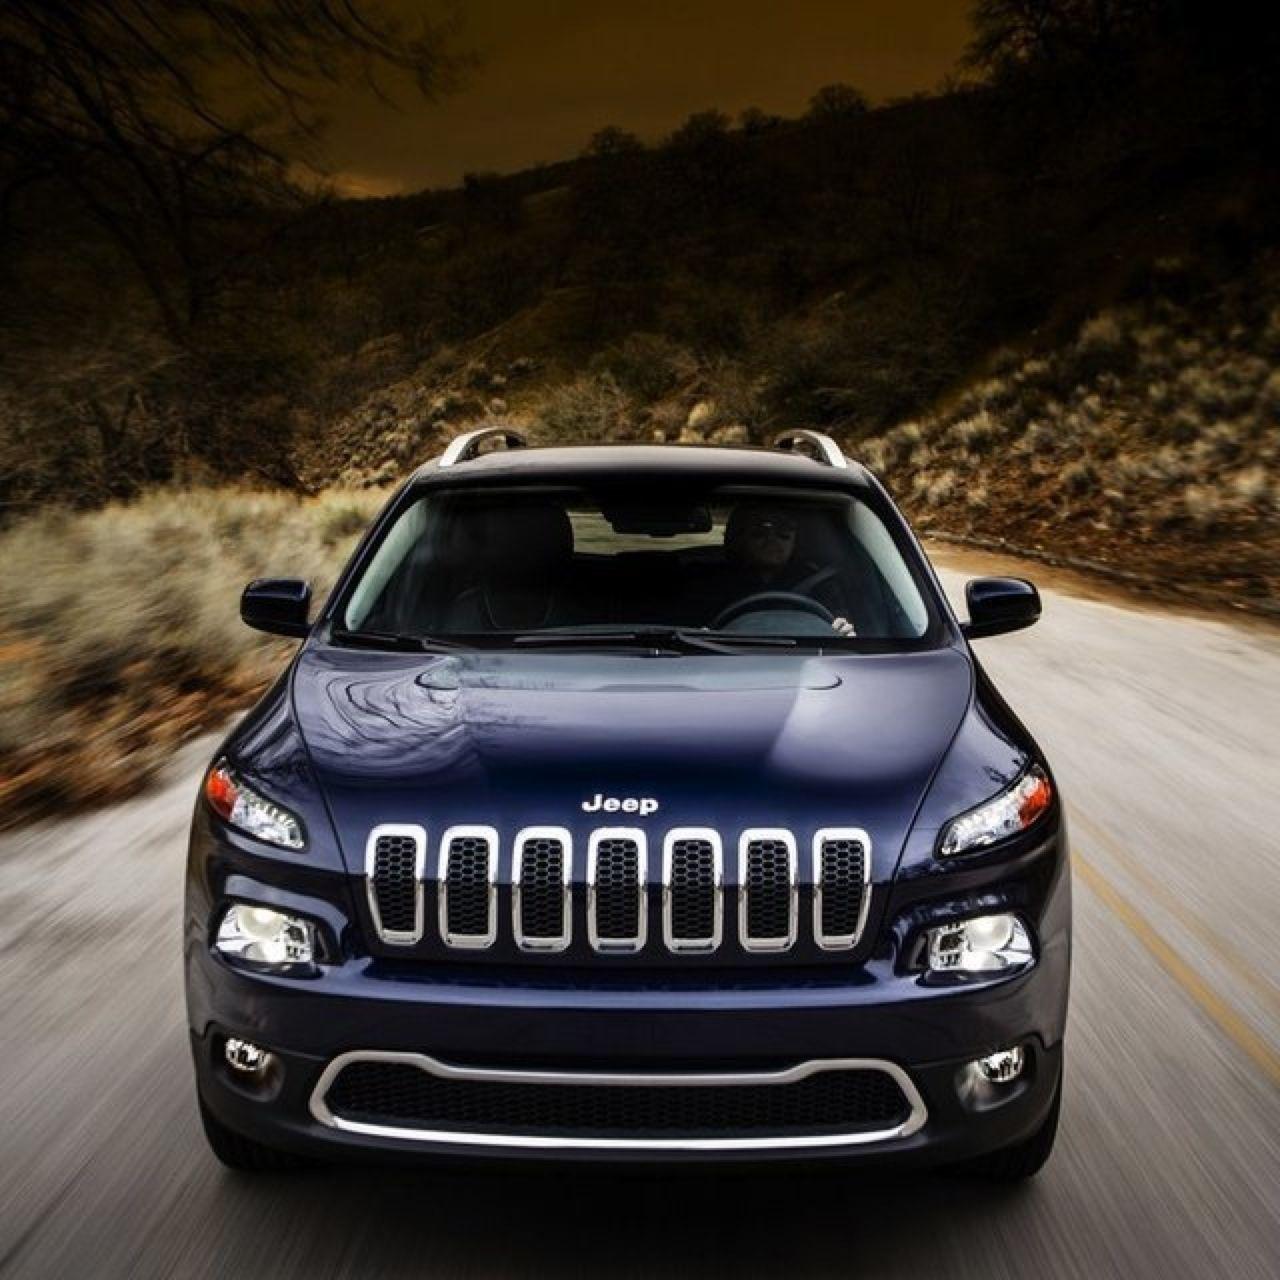 Jeep 2014 New jeep cherokee, Jeep cherokee, Jeep